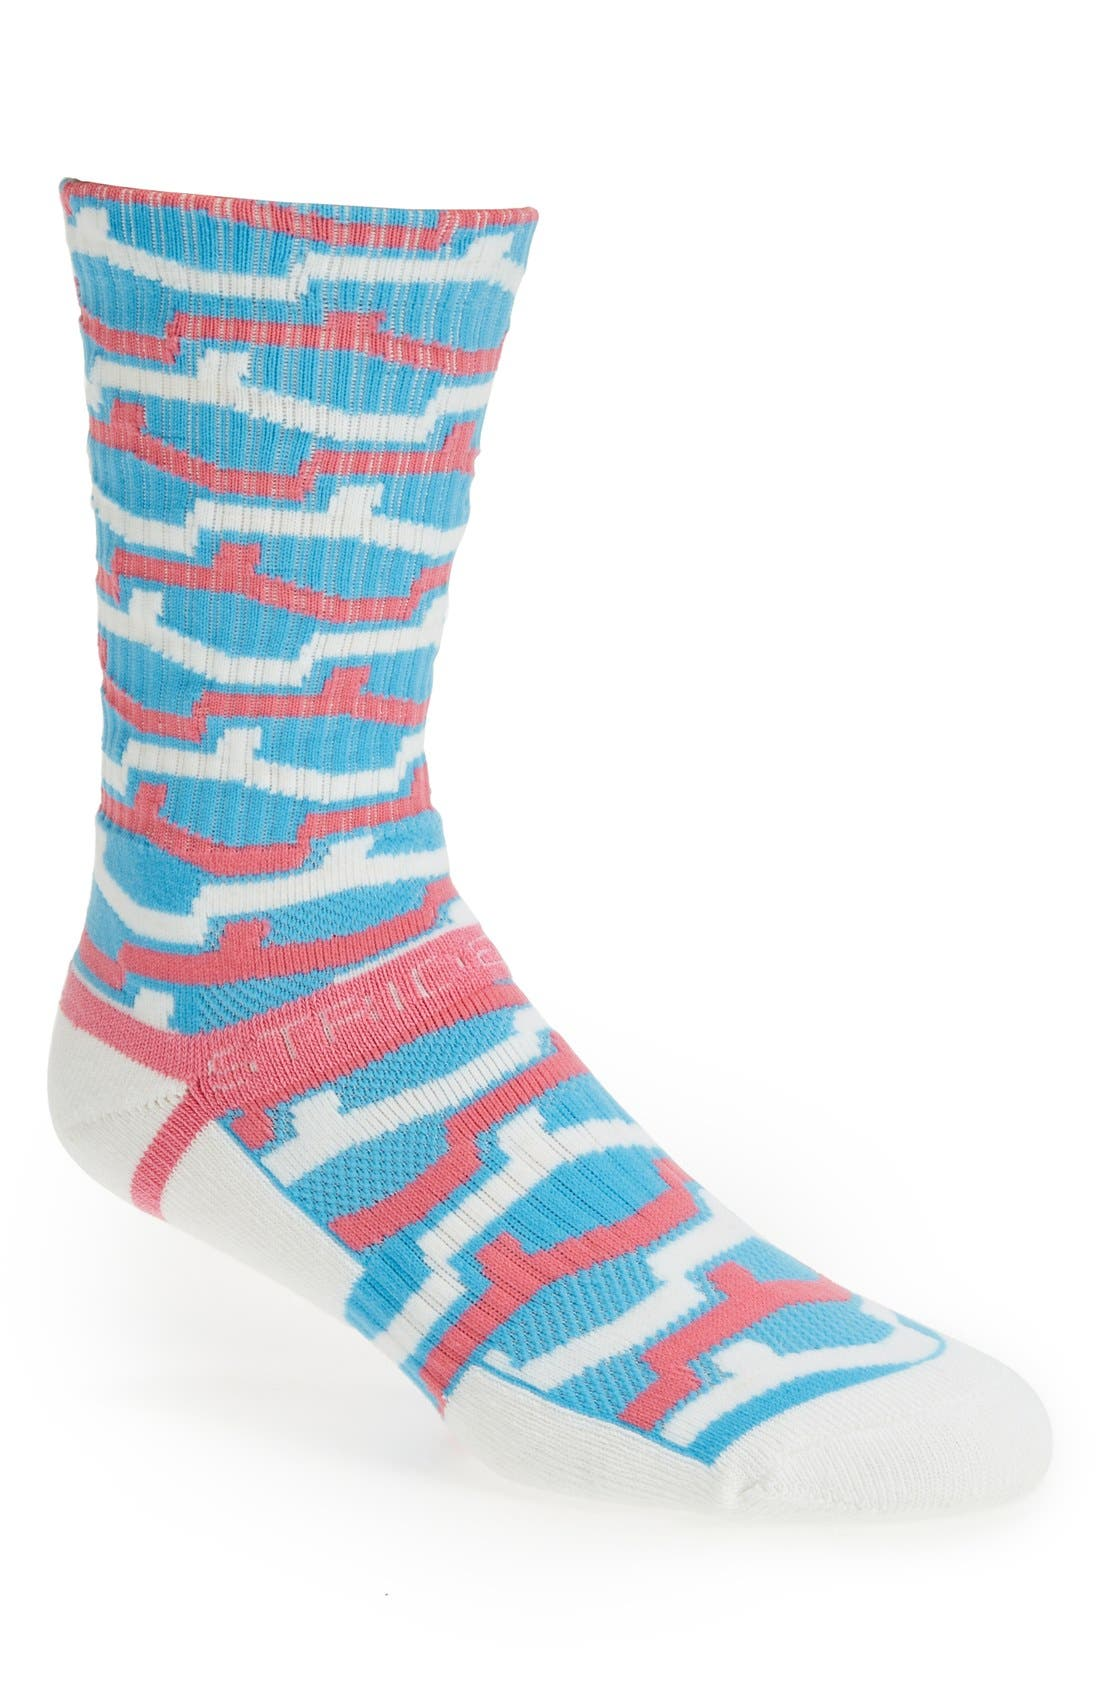 Main Image - STRIDELINE 'S Series - Hex' Socks